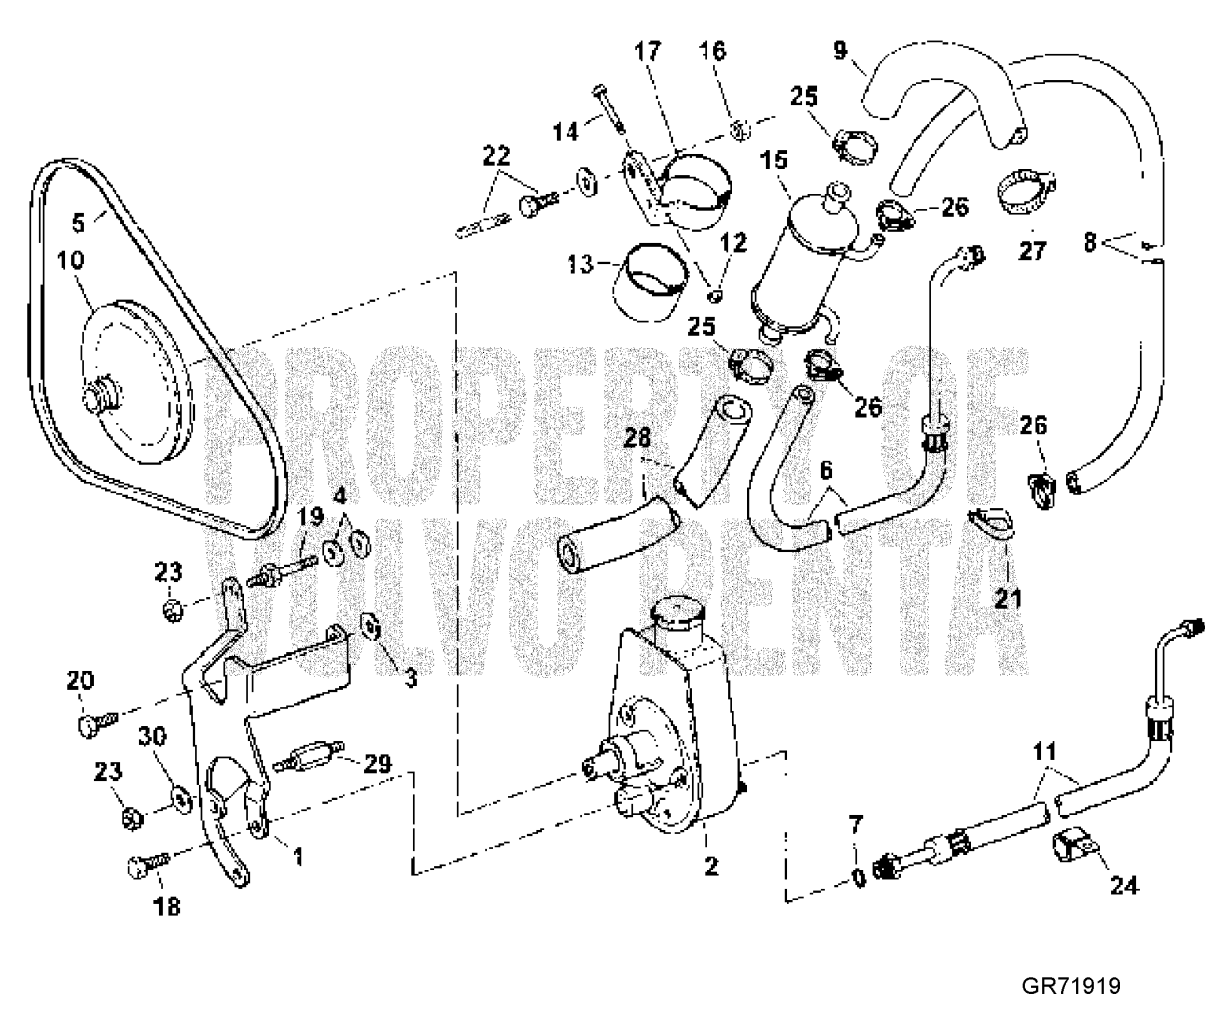 Steering 5.0GLPWTR, 5.0GiPWTR, 5.7GSIPWTR, 5.7GSPWTR